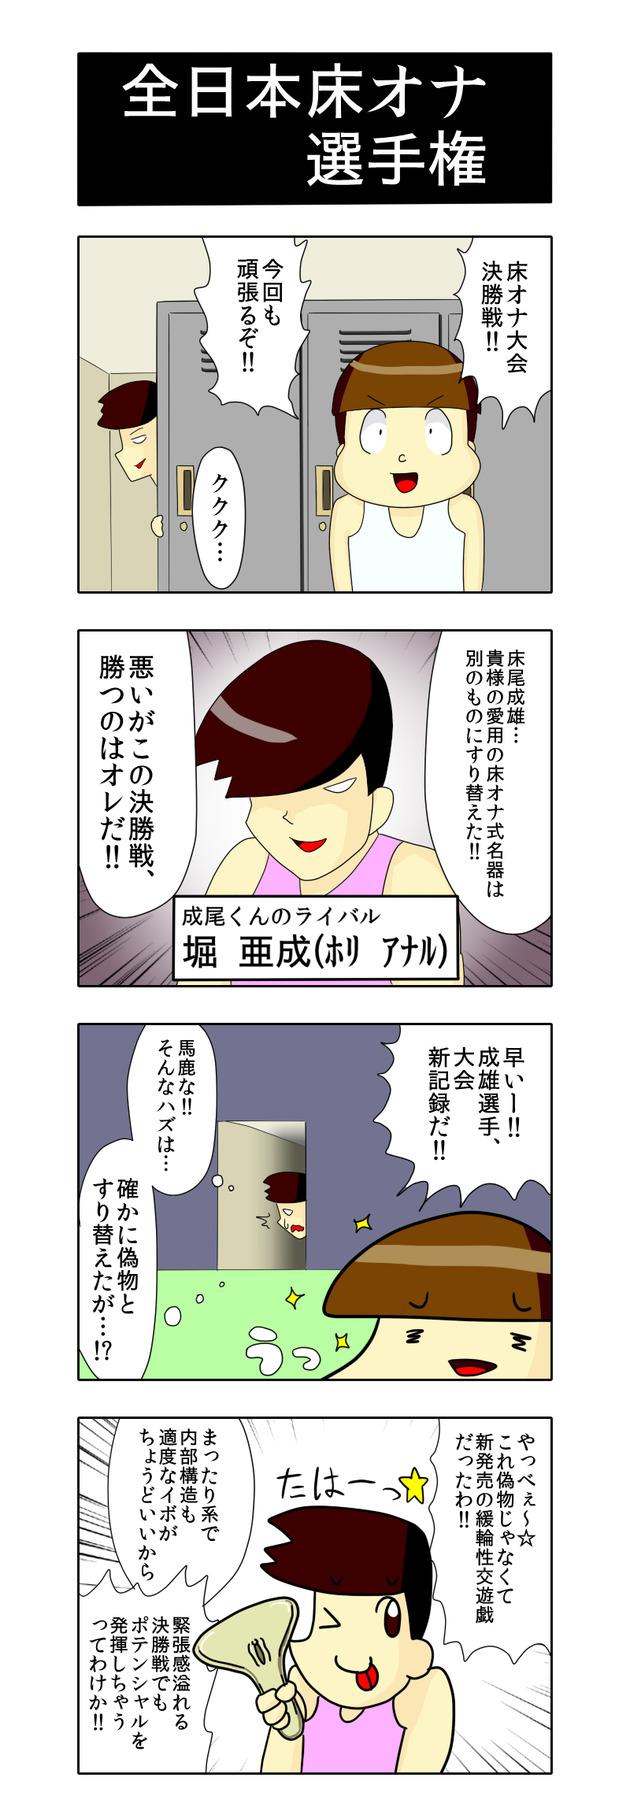 yukaona06